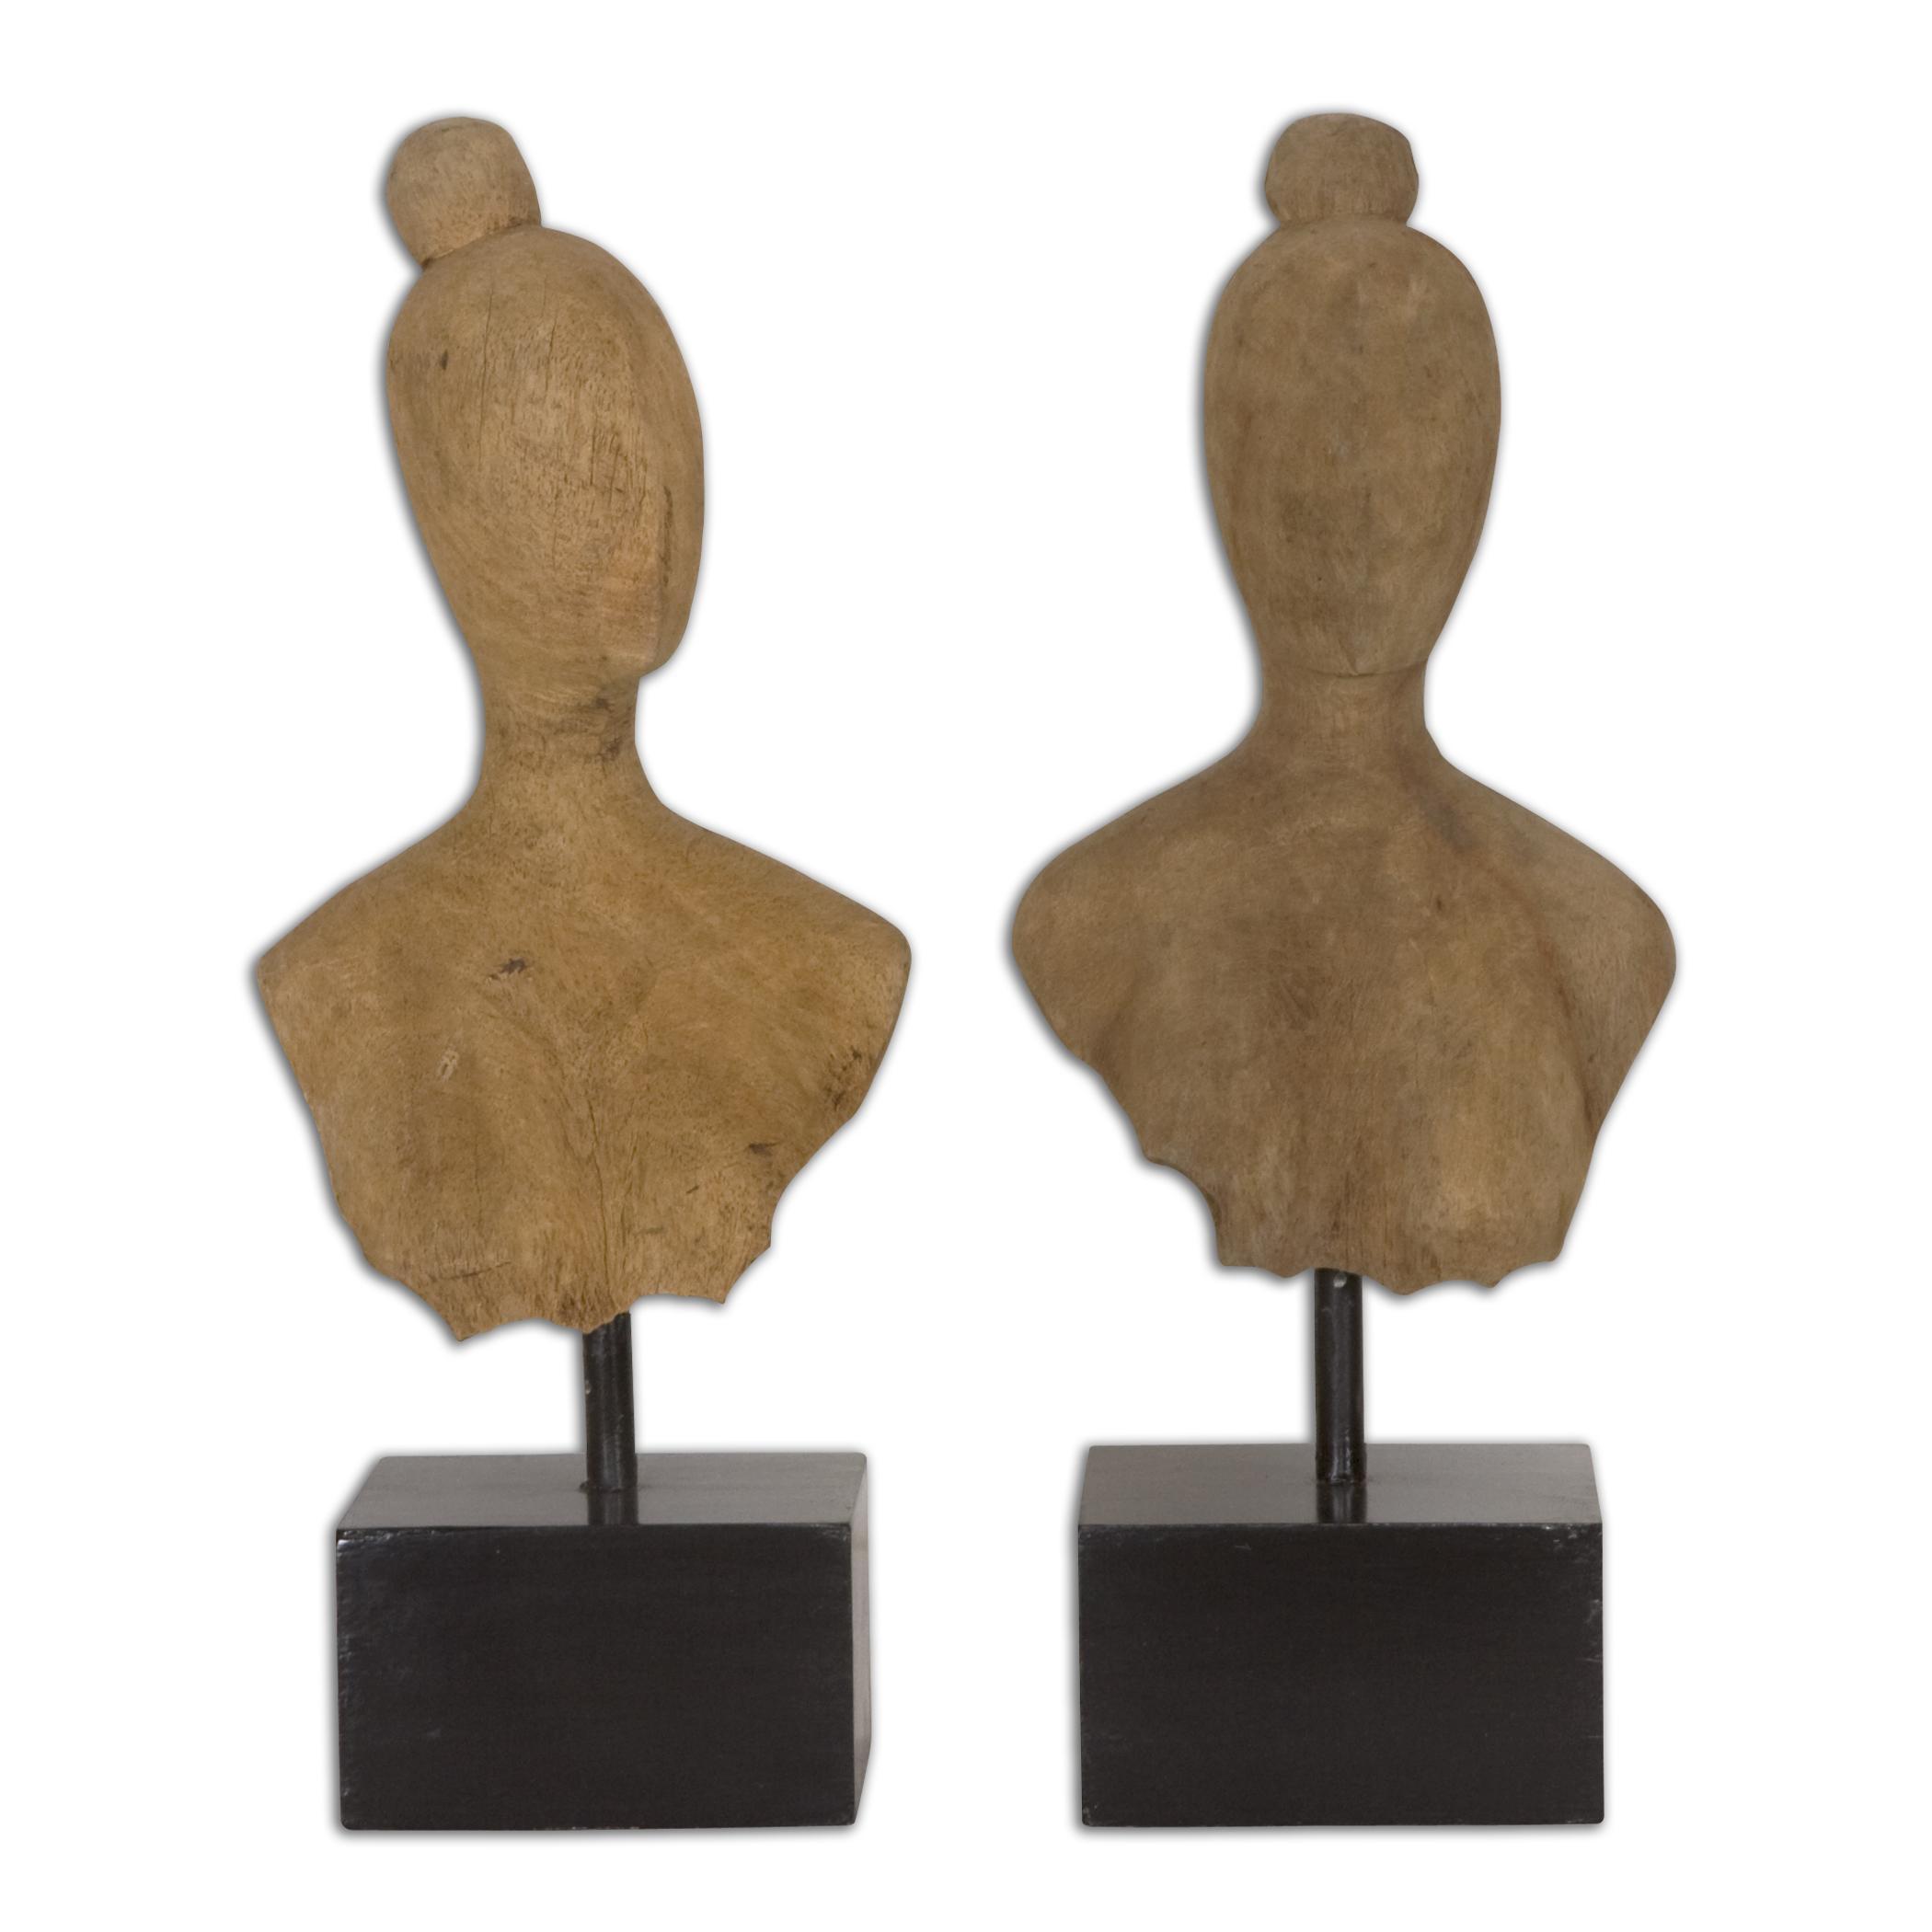 Uttermost Accessories Arlie Wooden Sculptures Set of 2 - Item Number: 19821